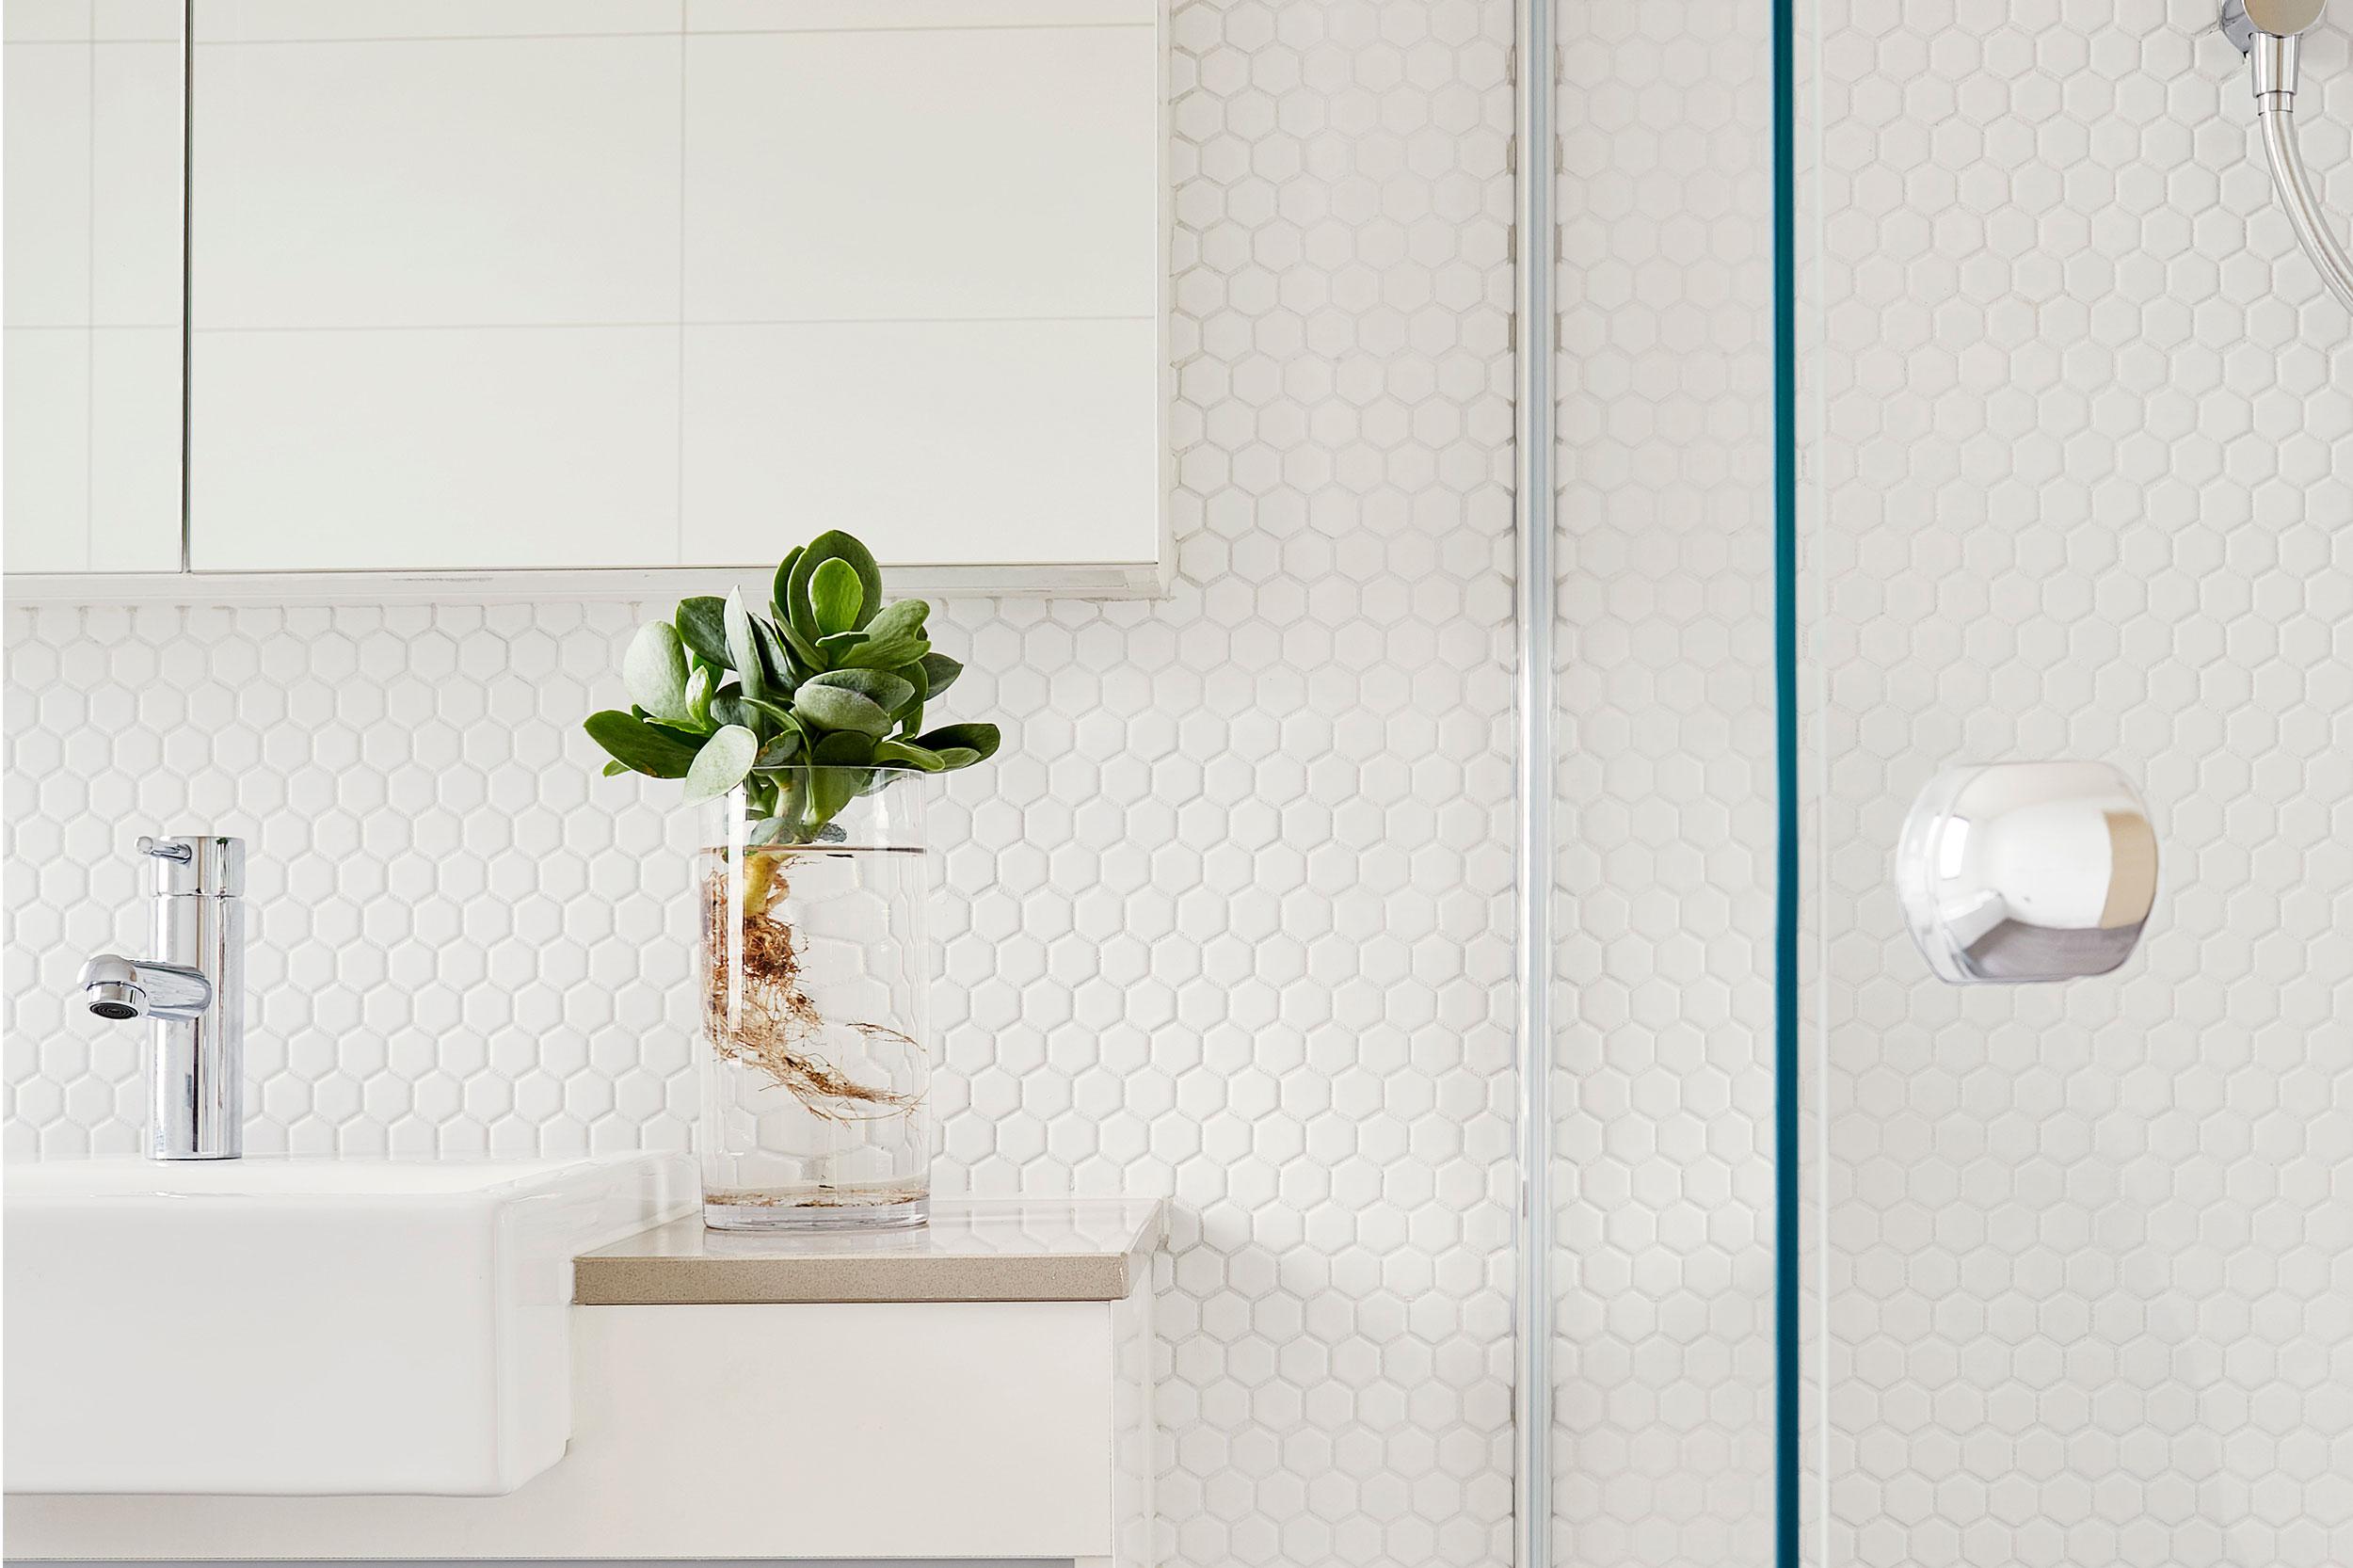 Sarah_Anderson_Photography_Property_Interiors_Bathroom